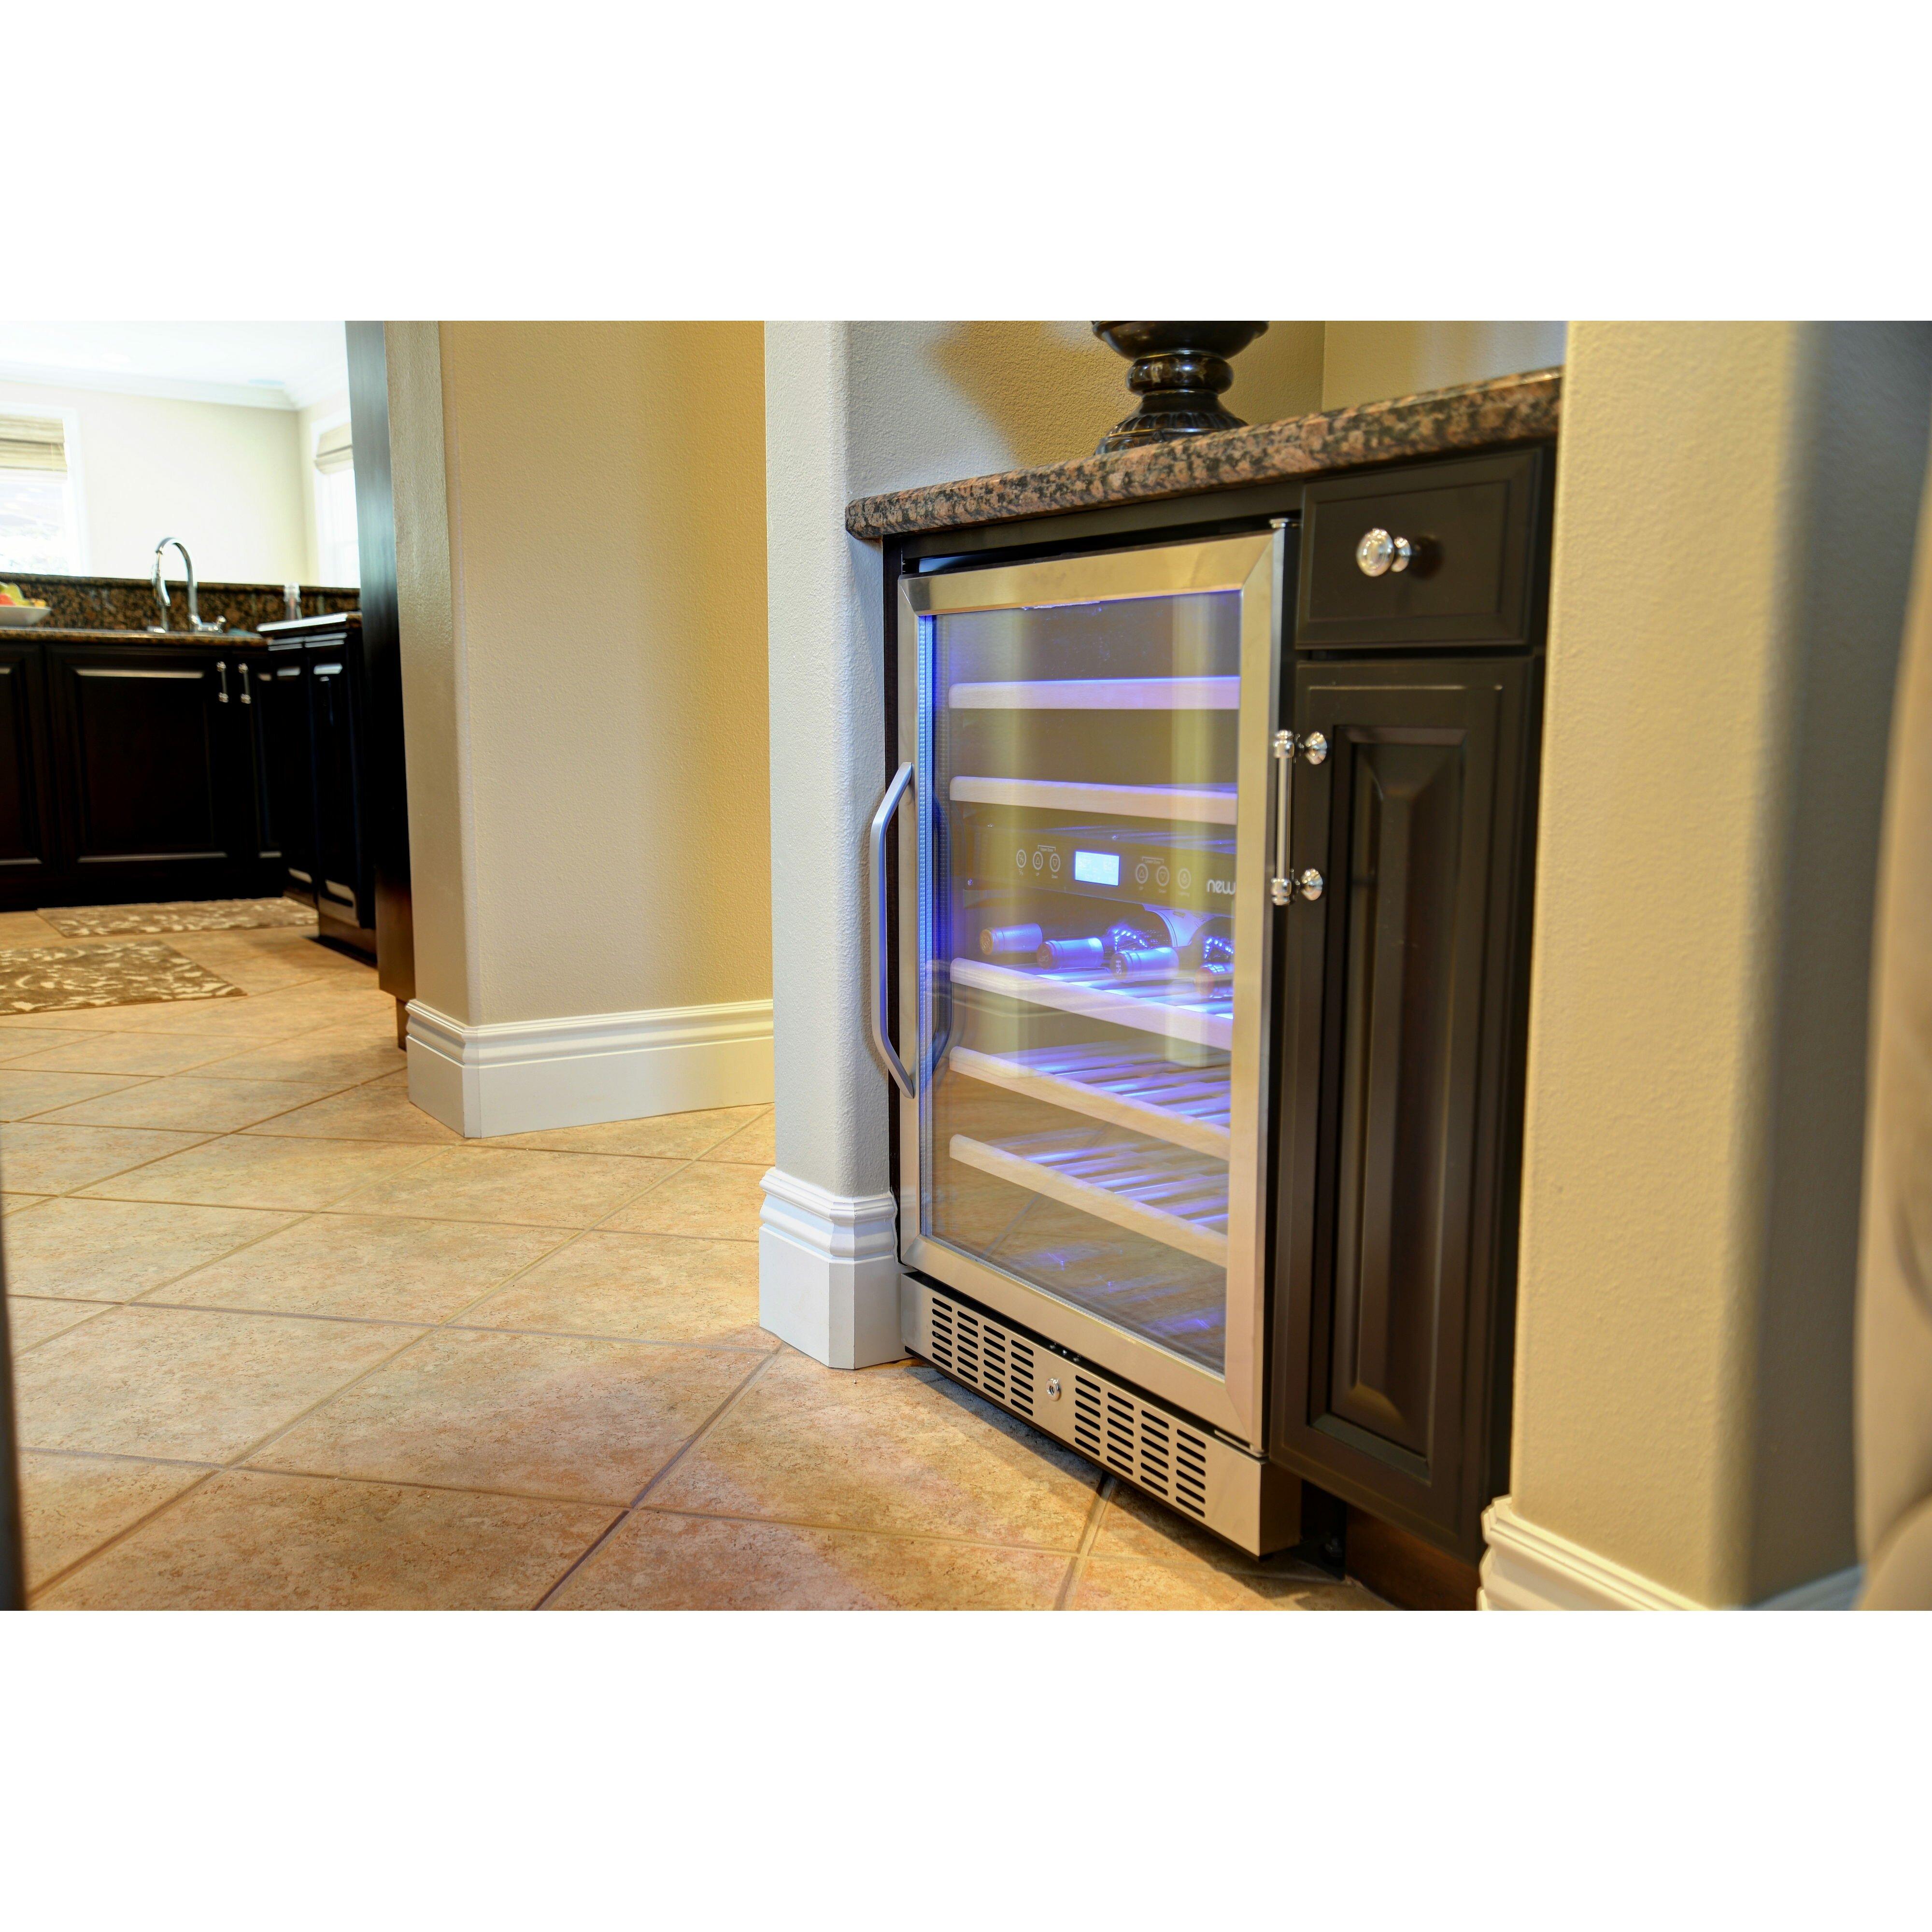 newair 46 bottle dual zone built in wine refrigerator reviews wayfair. Black Bedroom Furniture Sets. Home Design Ideas